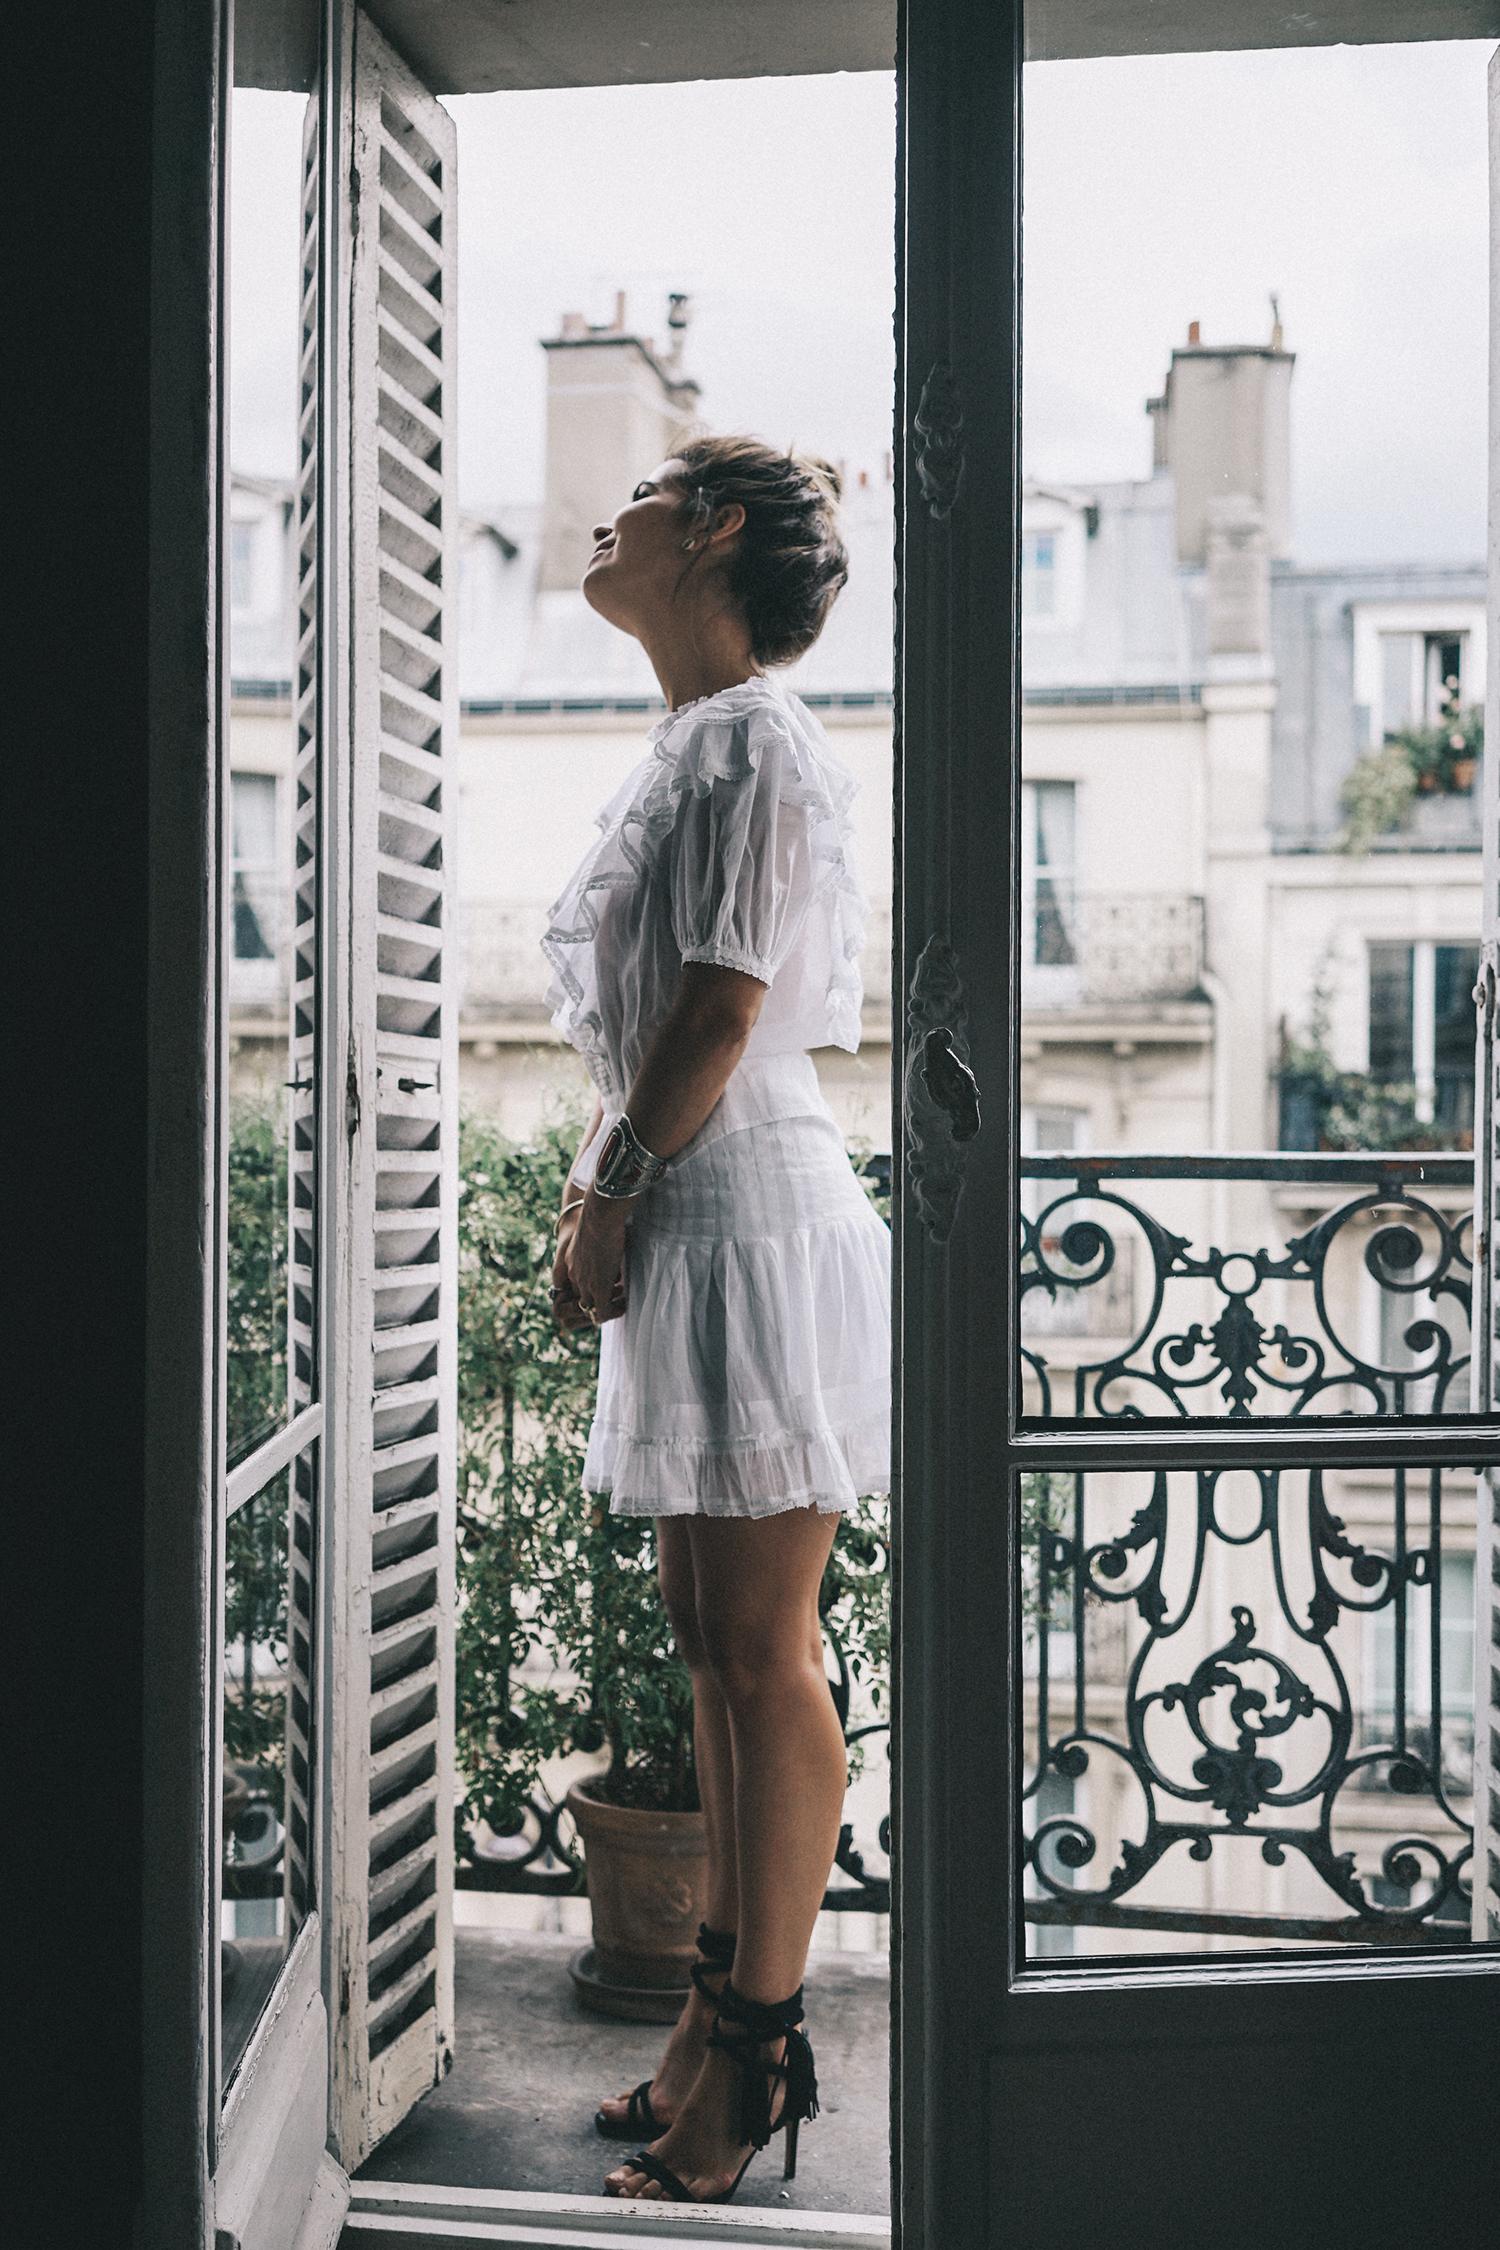 Home_Away-Isabel_Marant_Dress-Outfit-Paris-Collage_Vintage-11